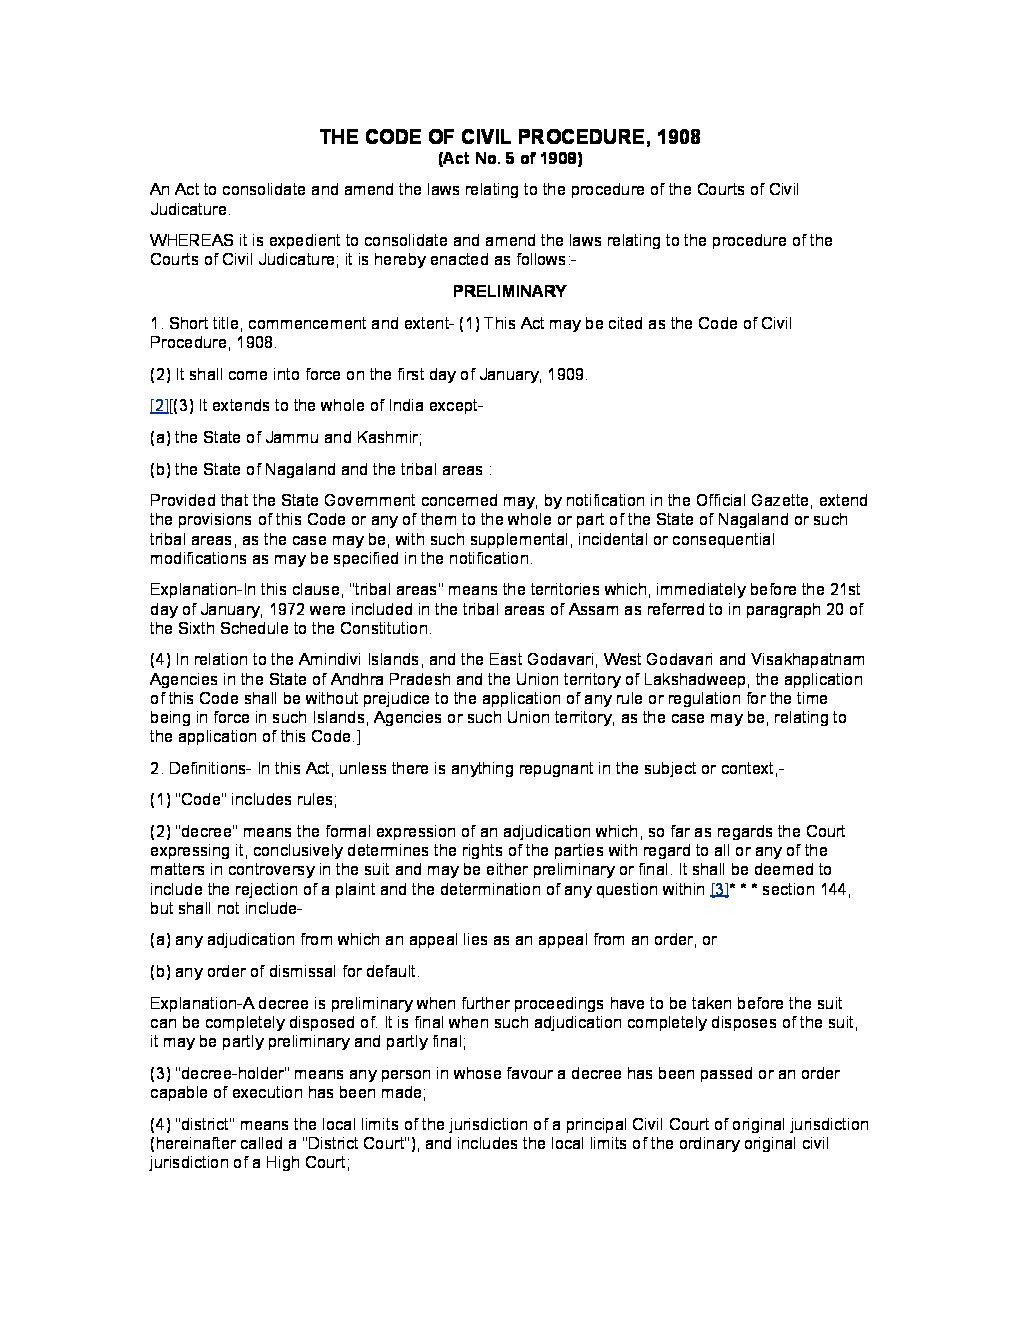 Code of civil procedure 1908 pdf